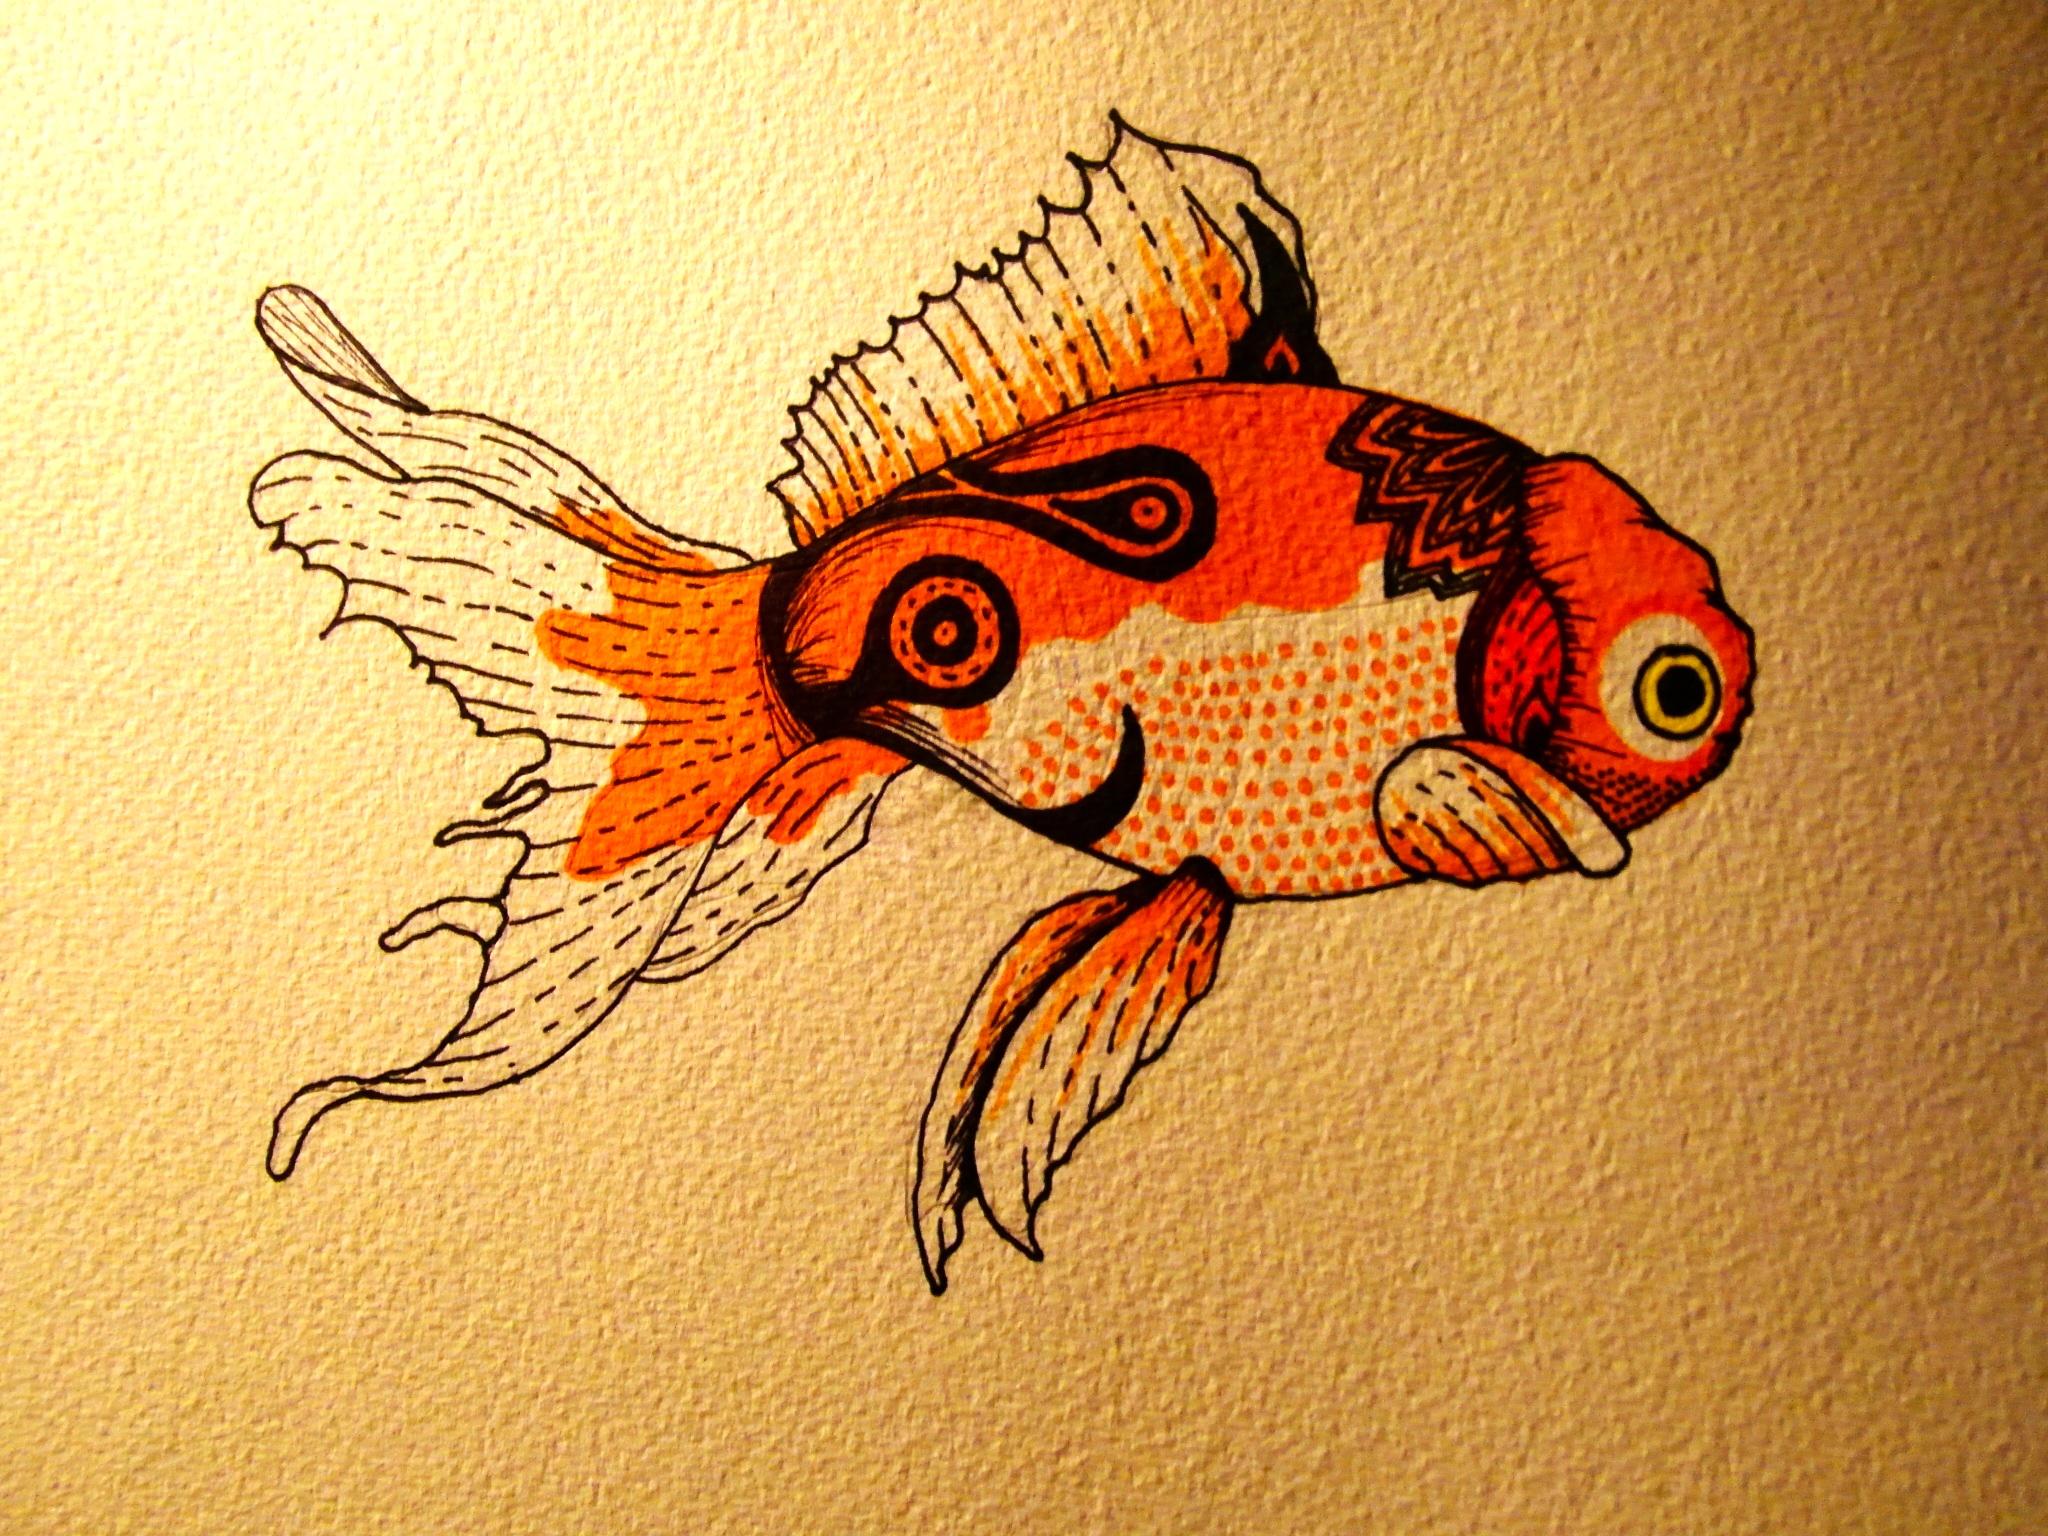 Abstract fish designs - photo#1